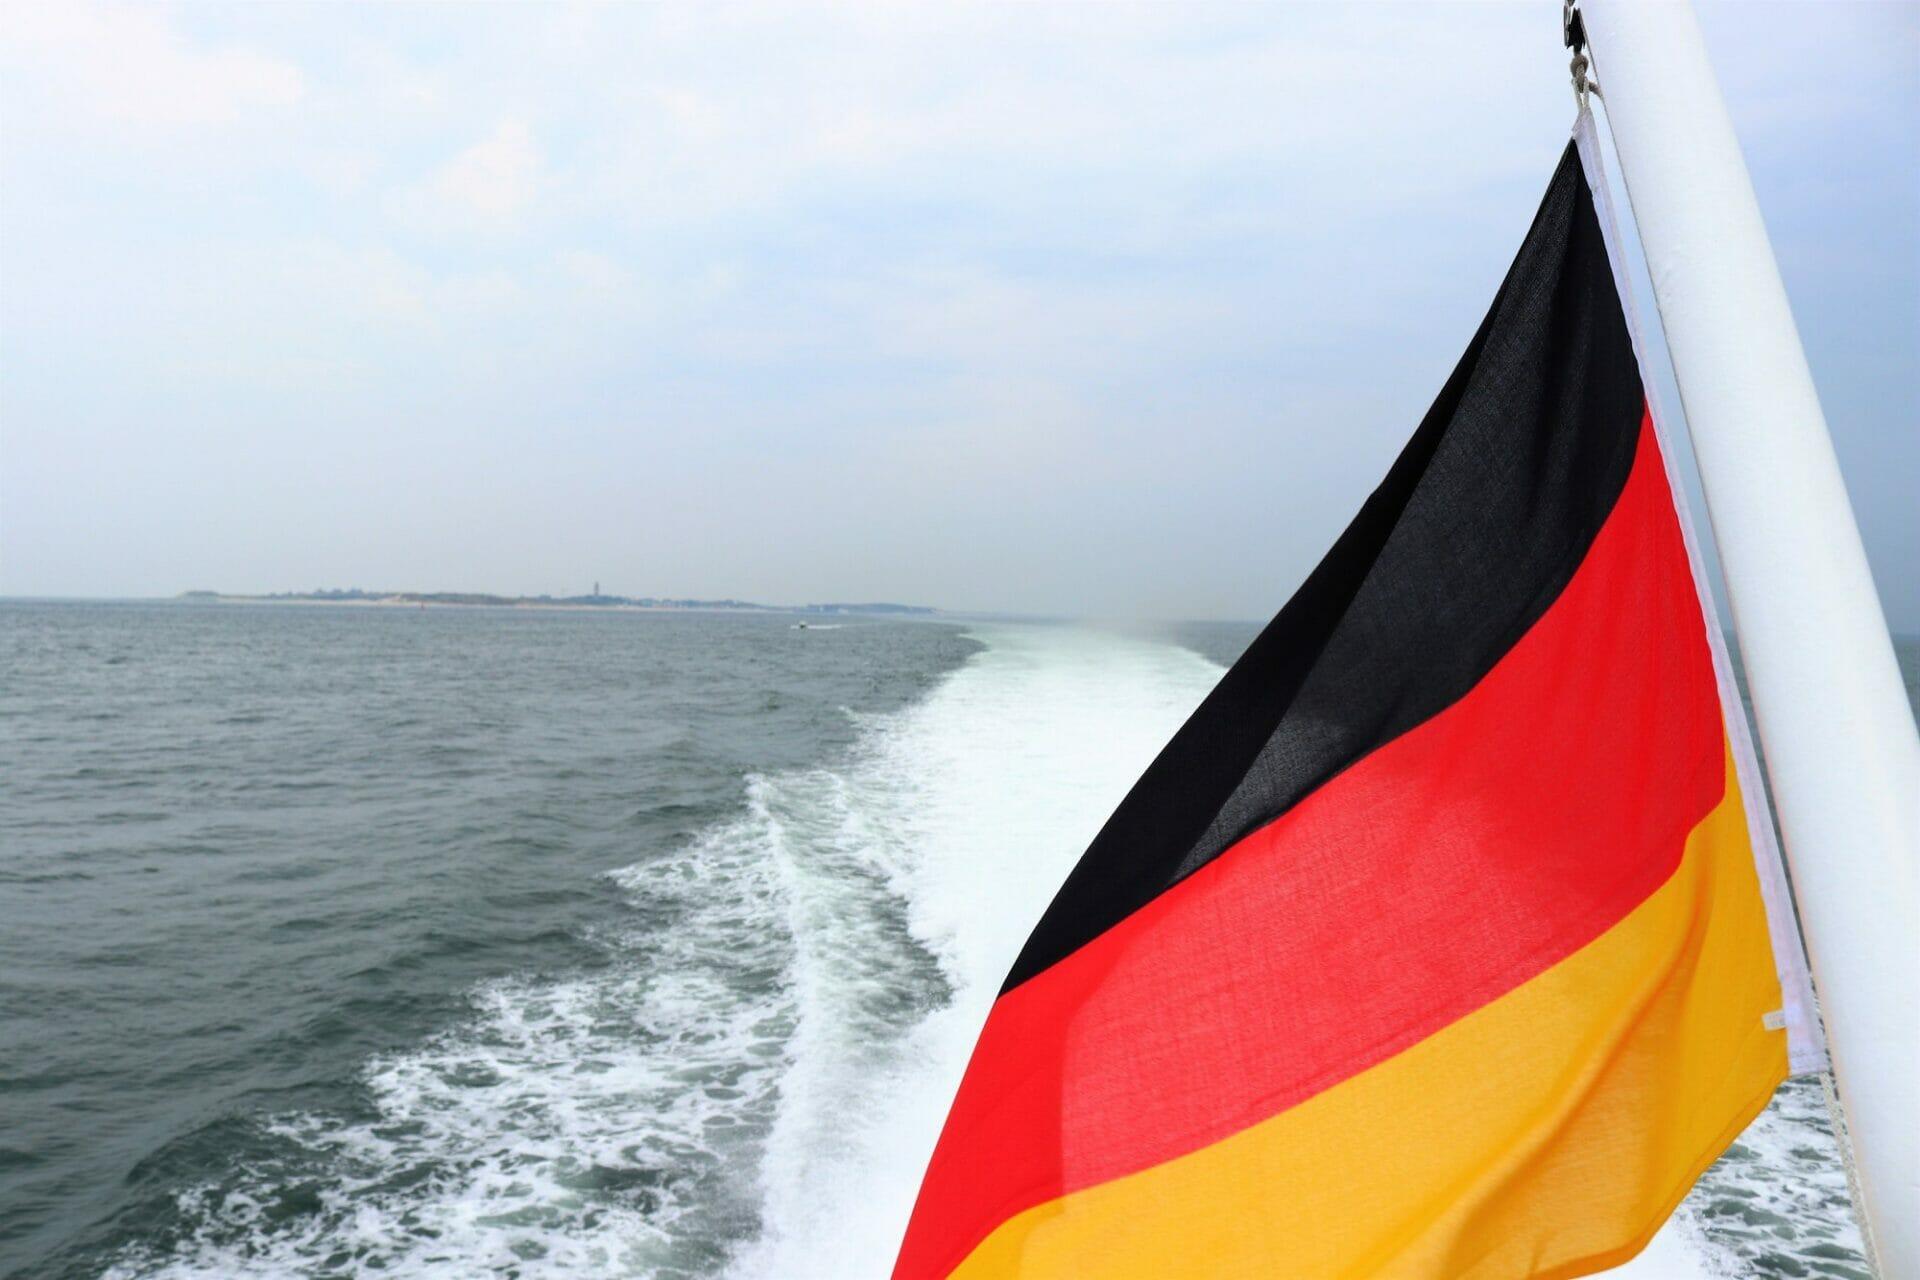 https://direitonovo.com/wp-content/uploads/2021/08/red-yellow-and-black-flag-on-beach-during-daytime_d8d948ae5ec1c87b77e758bc4a9b4b7e_2000.jpg